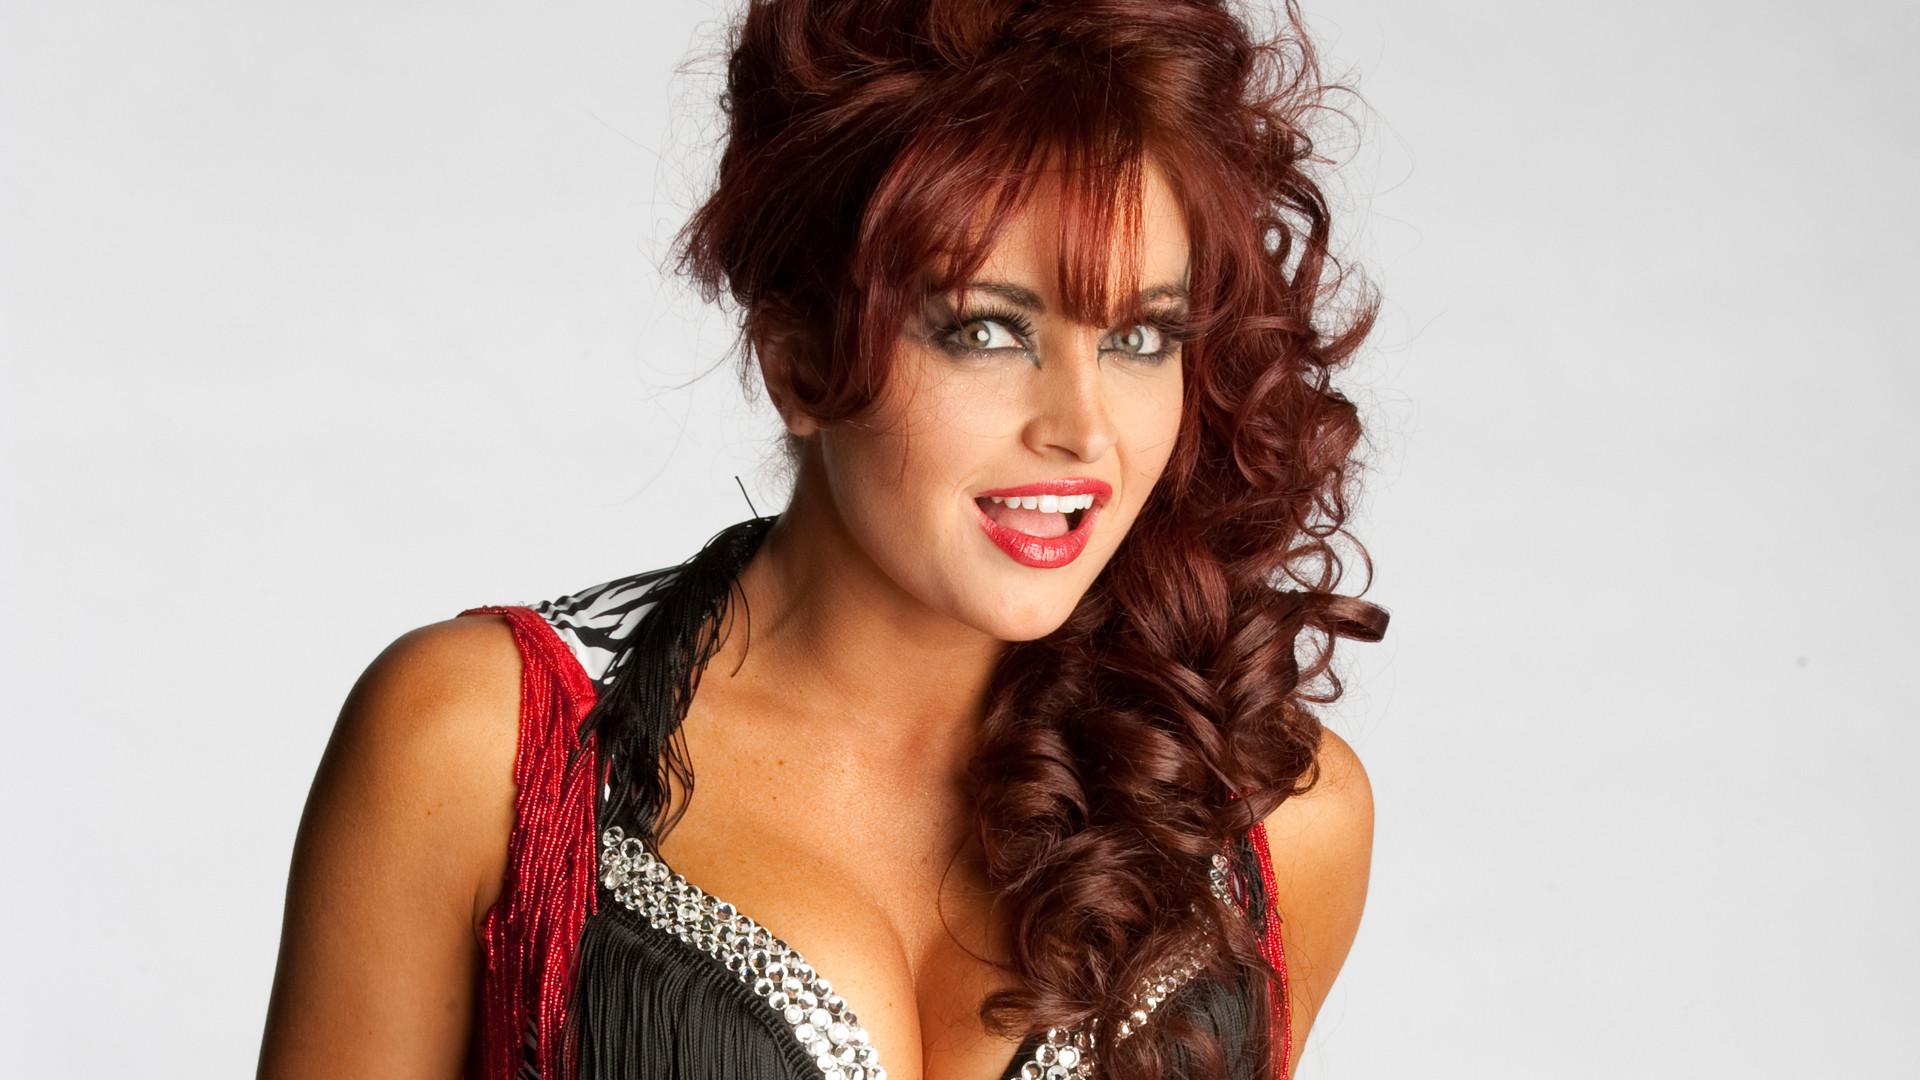 One of the MANY looks of Maria Kanellis   All-Time Favorite Wrestling Divas/Knockouts    Pinterest   Wrestling divas